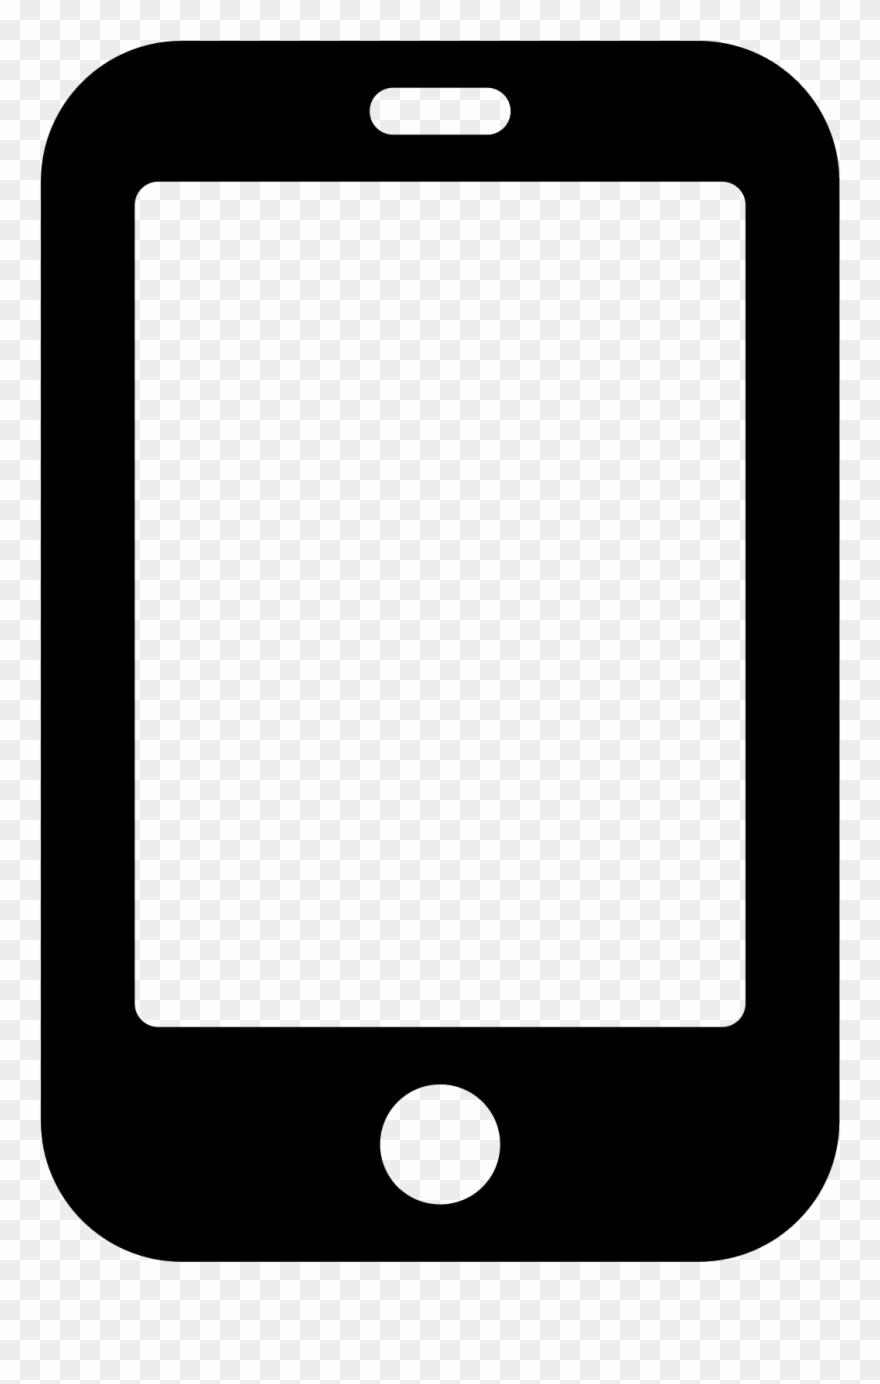 tablet-computer # 4959962